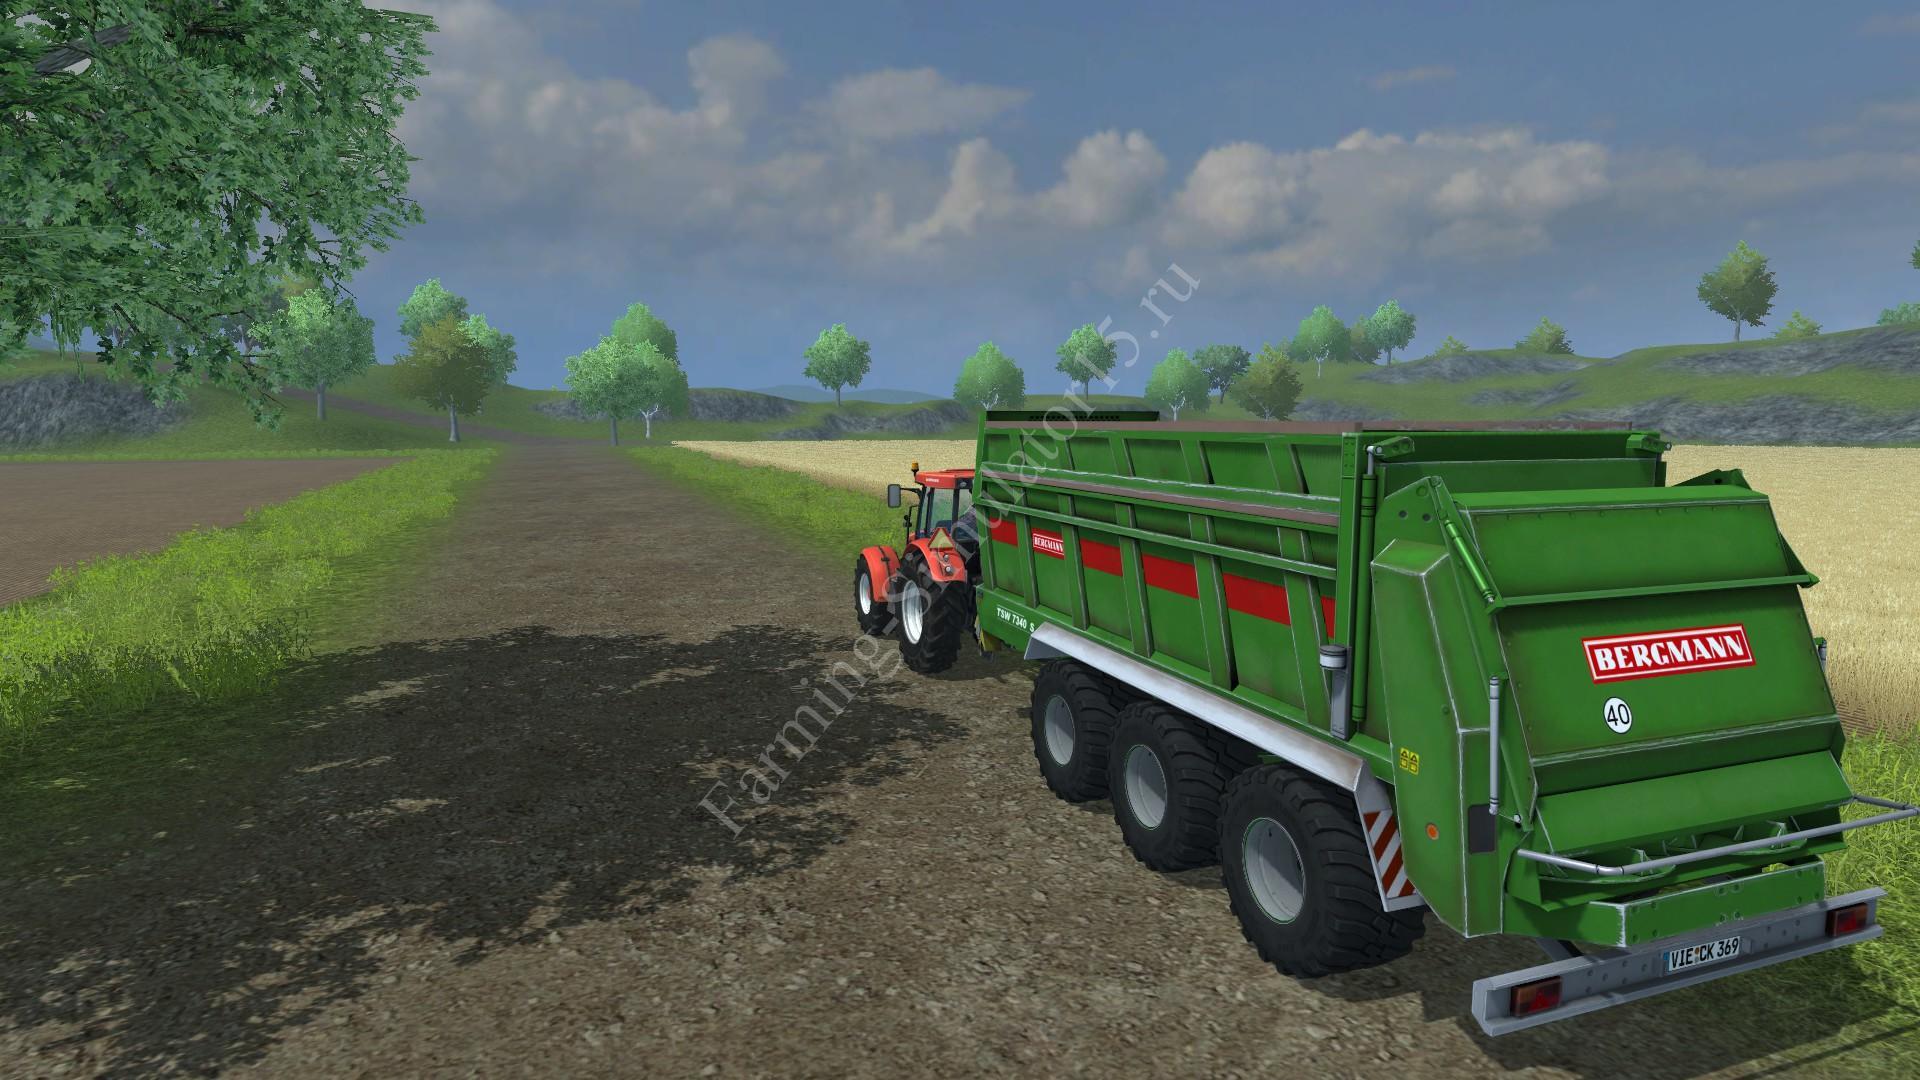 Мод прицепа для удобрений Bergmann TSW 7340S v 1.0 Farming Simulator 2013, Farming Simulator 13